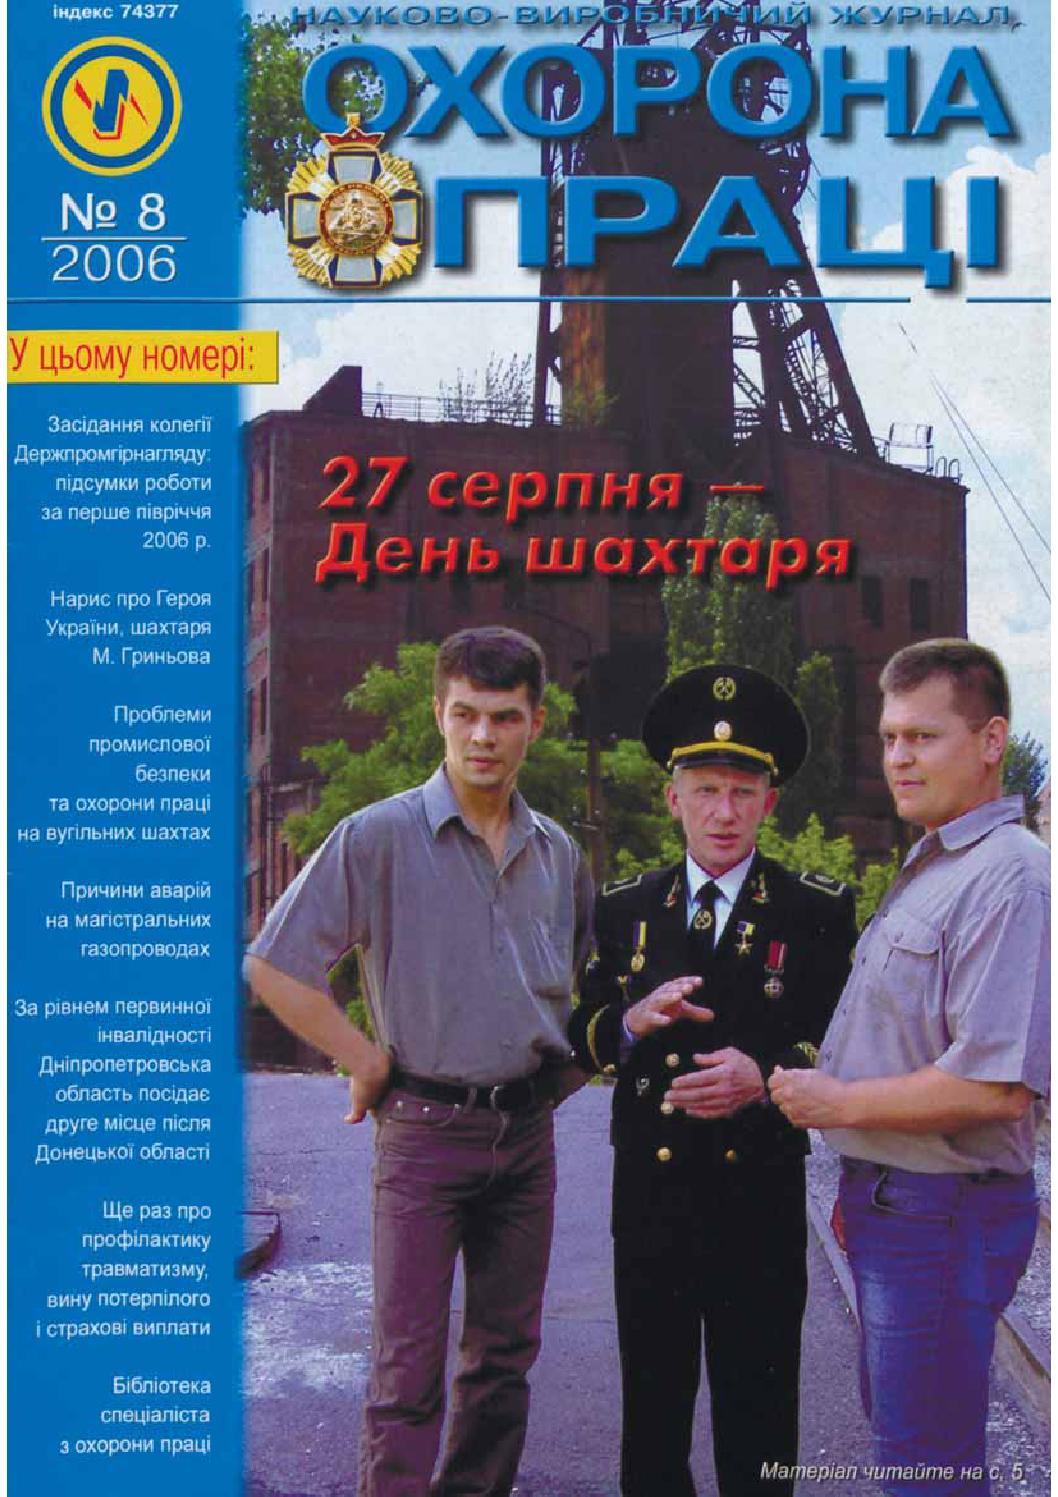 ohorona-pratsi-06-08 by Охрана труда - issuu 40003f5bed970